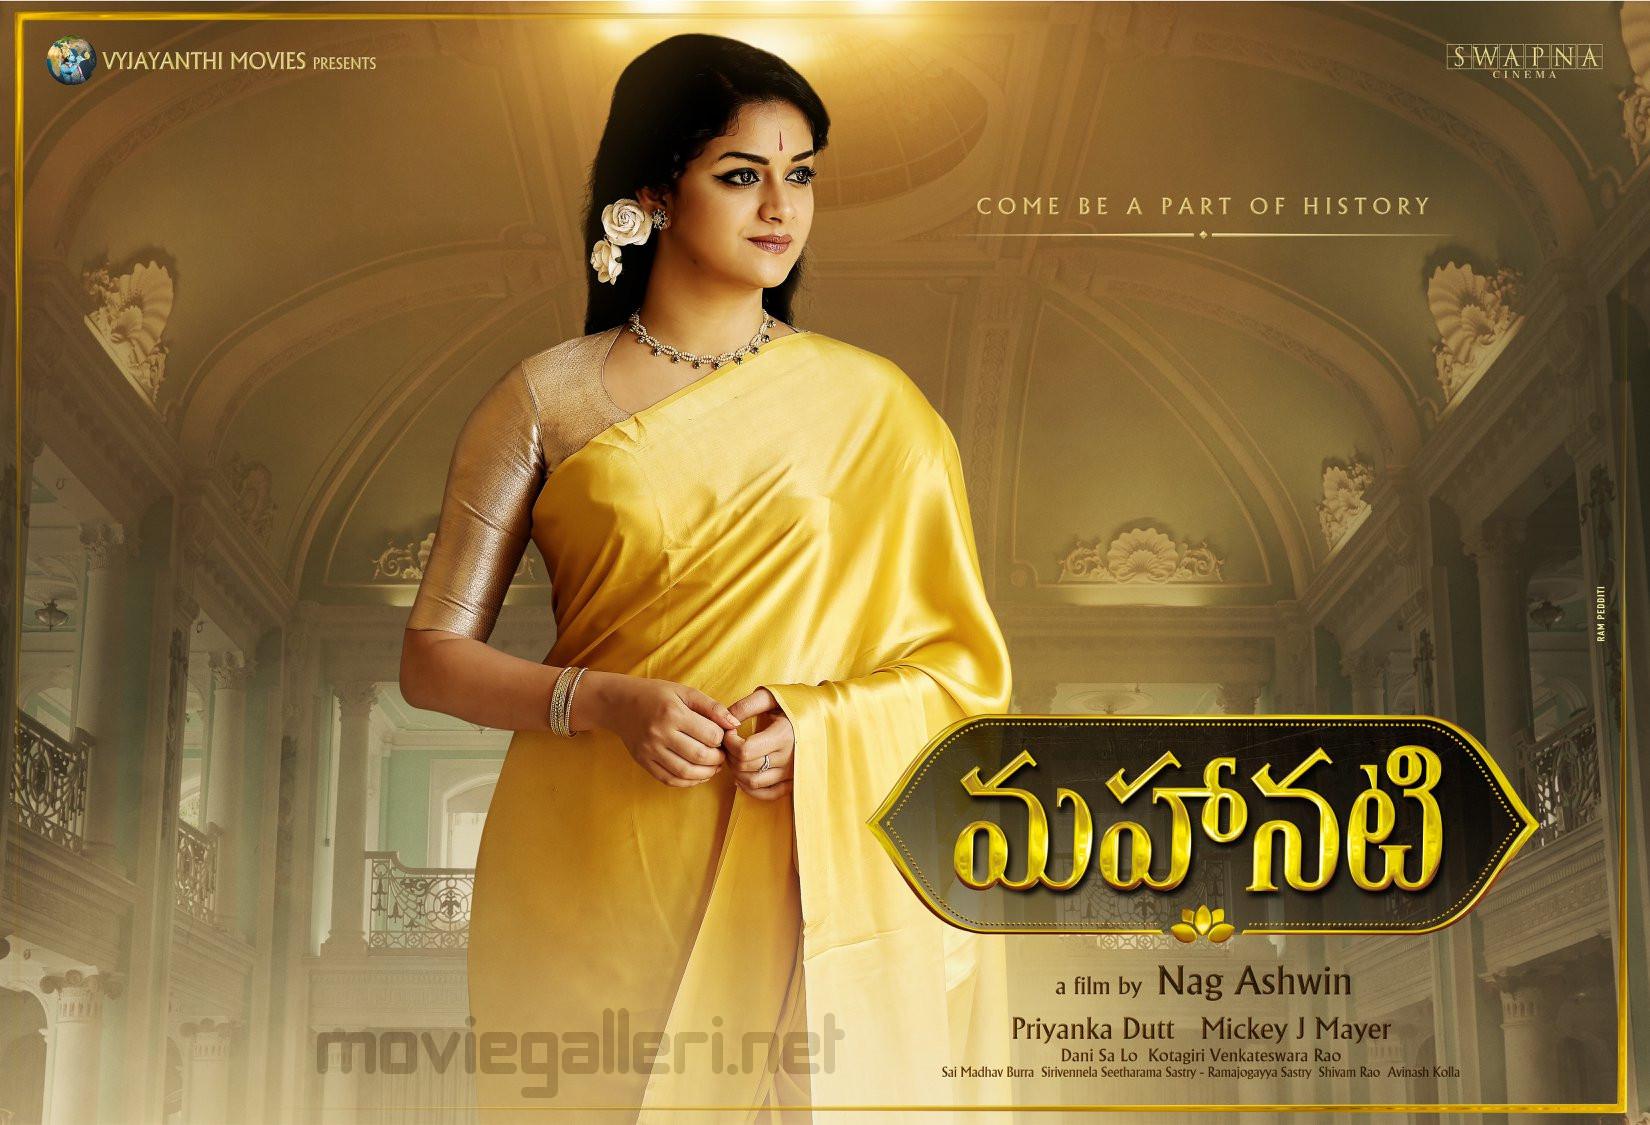 Actress Keerthy Suresh as Savitri from Mahanati Classic Poster HD